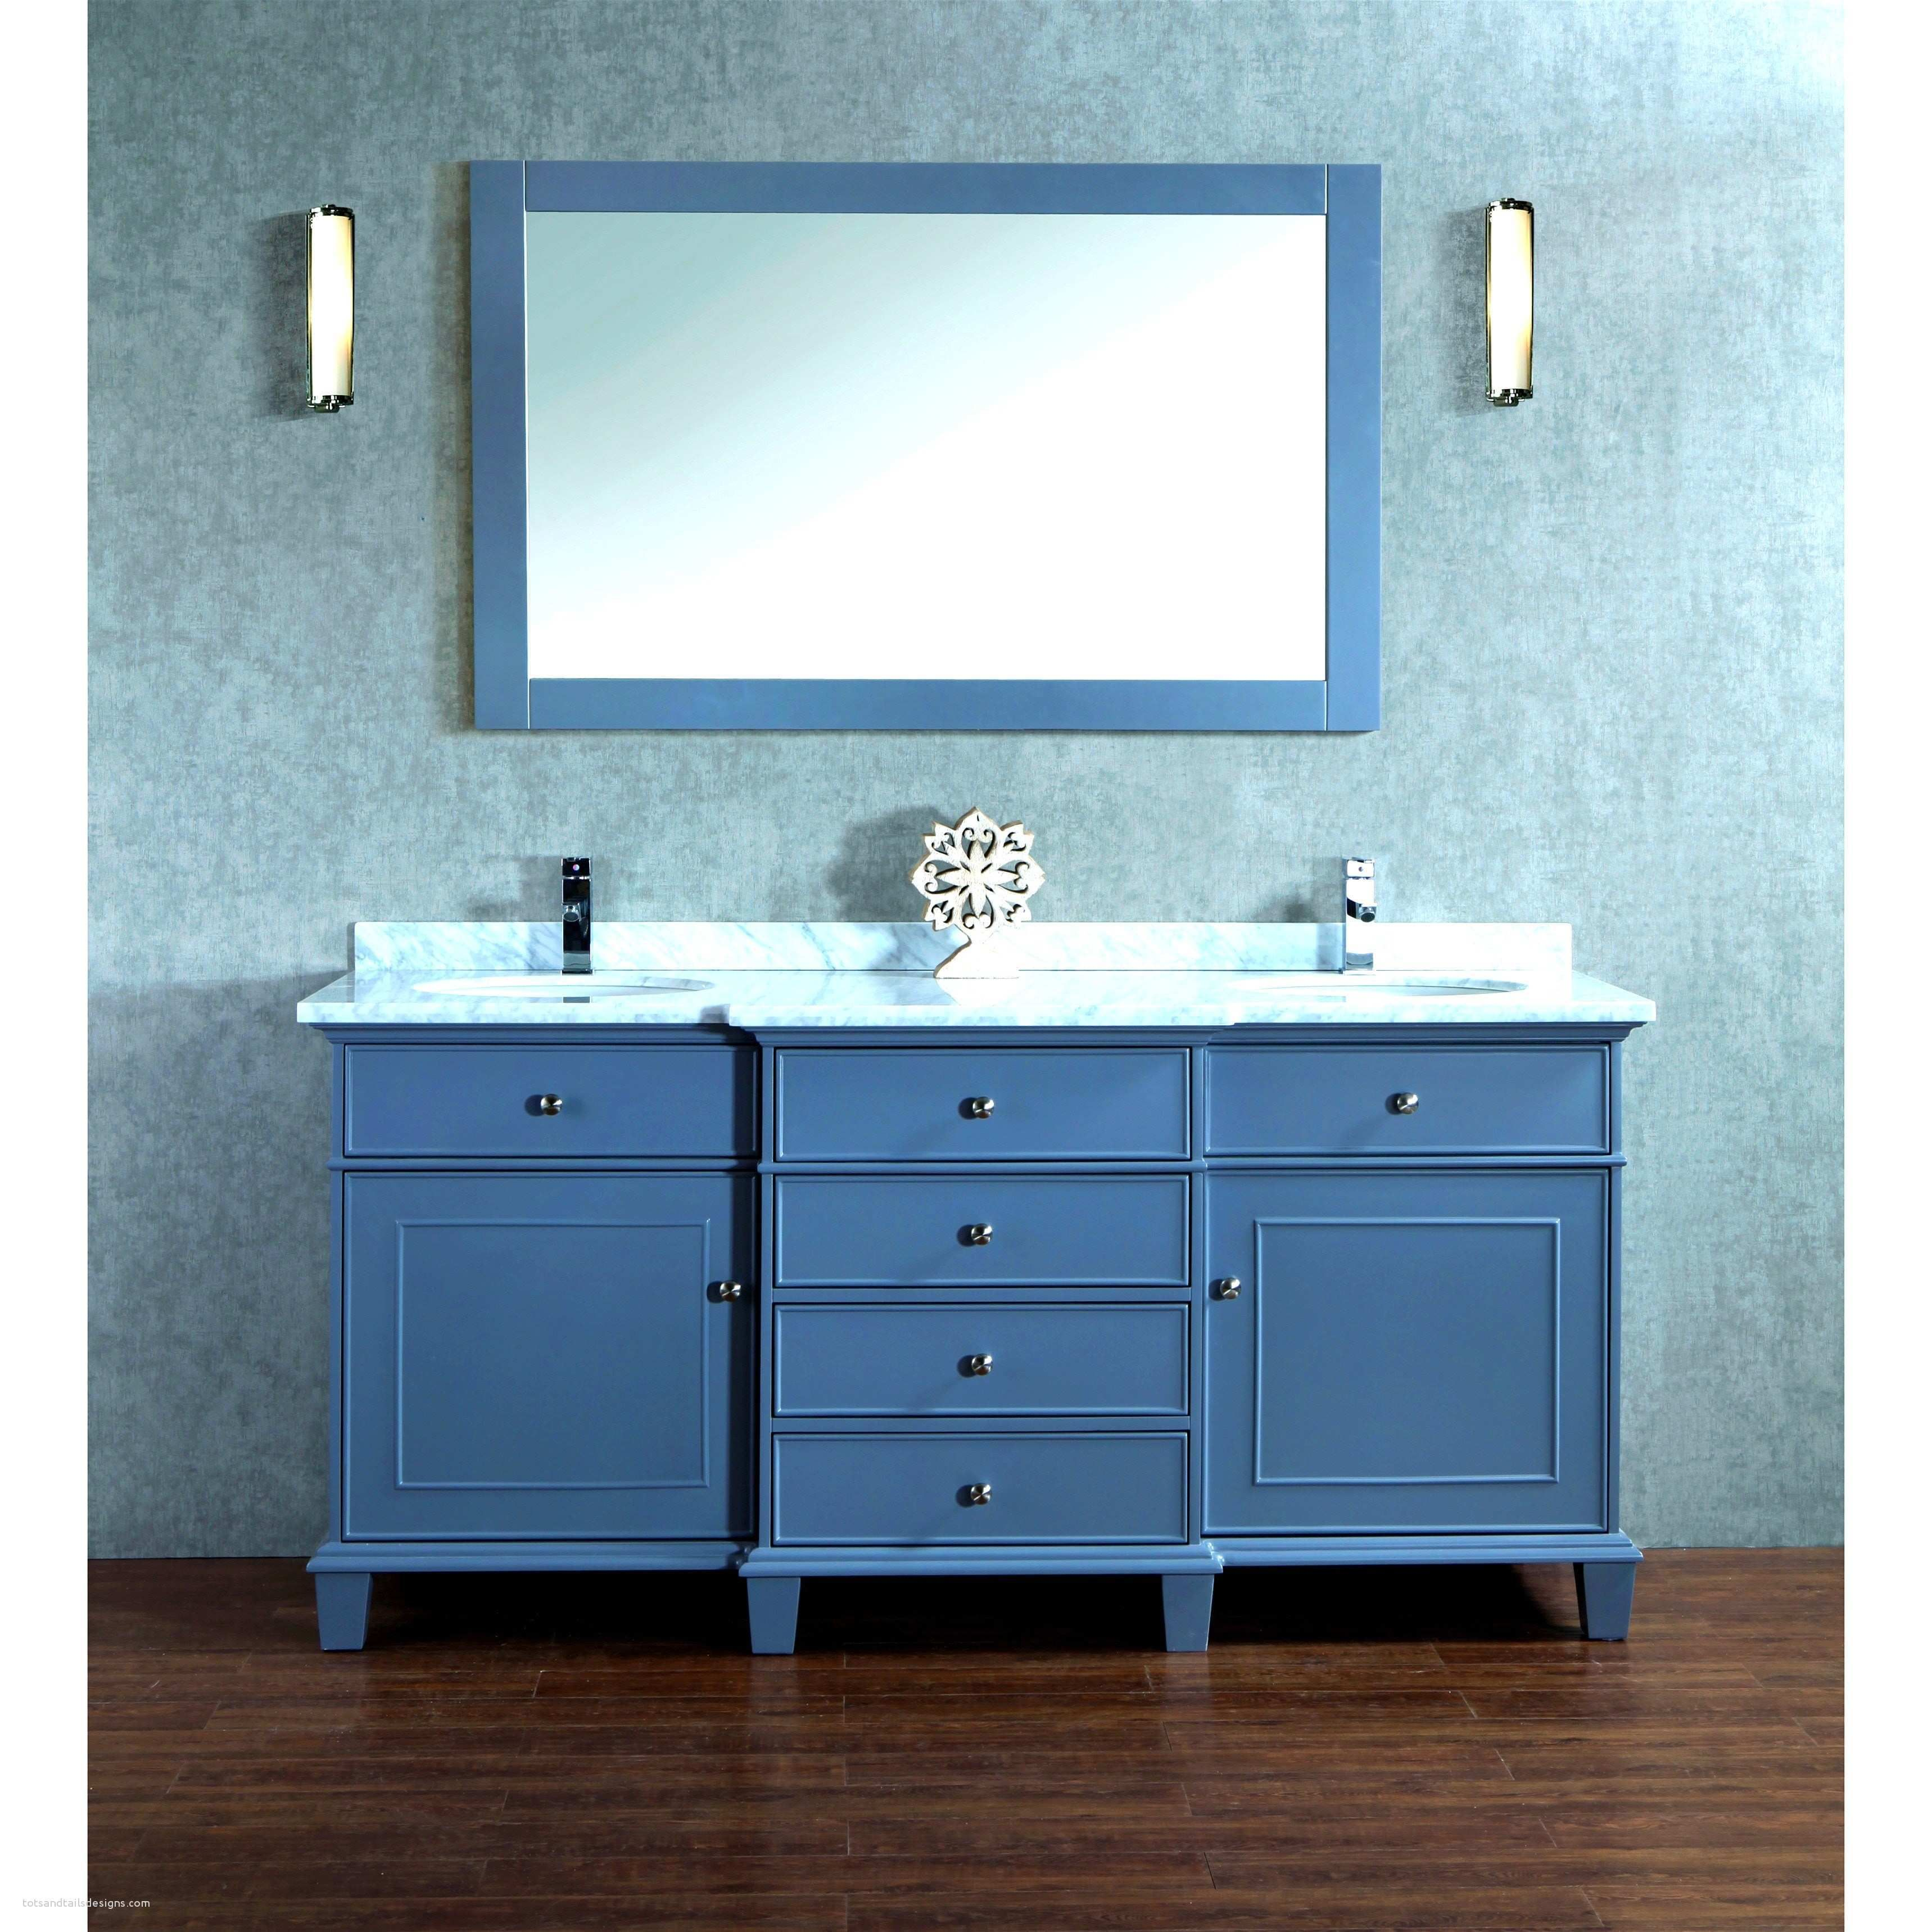 19 Amazing Costco Bathroom Vanities Ceplukan Bathroom Decor Luxury Double Sink Bathroom Teal Bathroom Decor